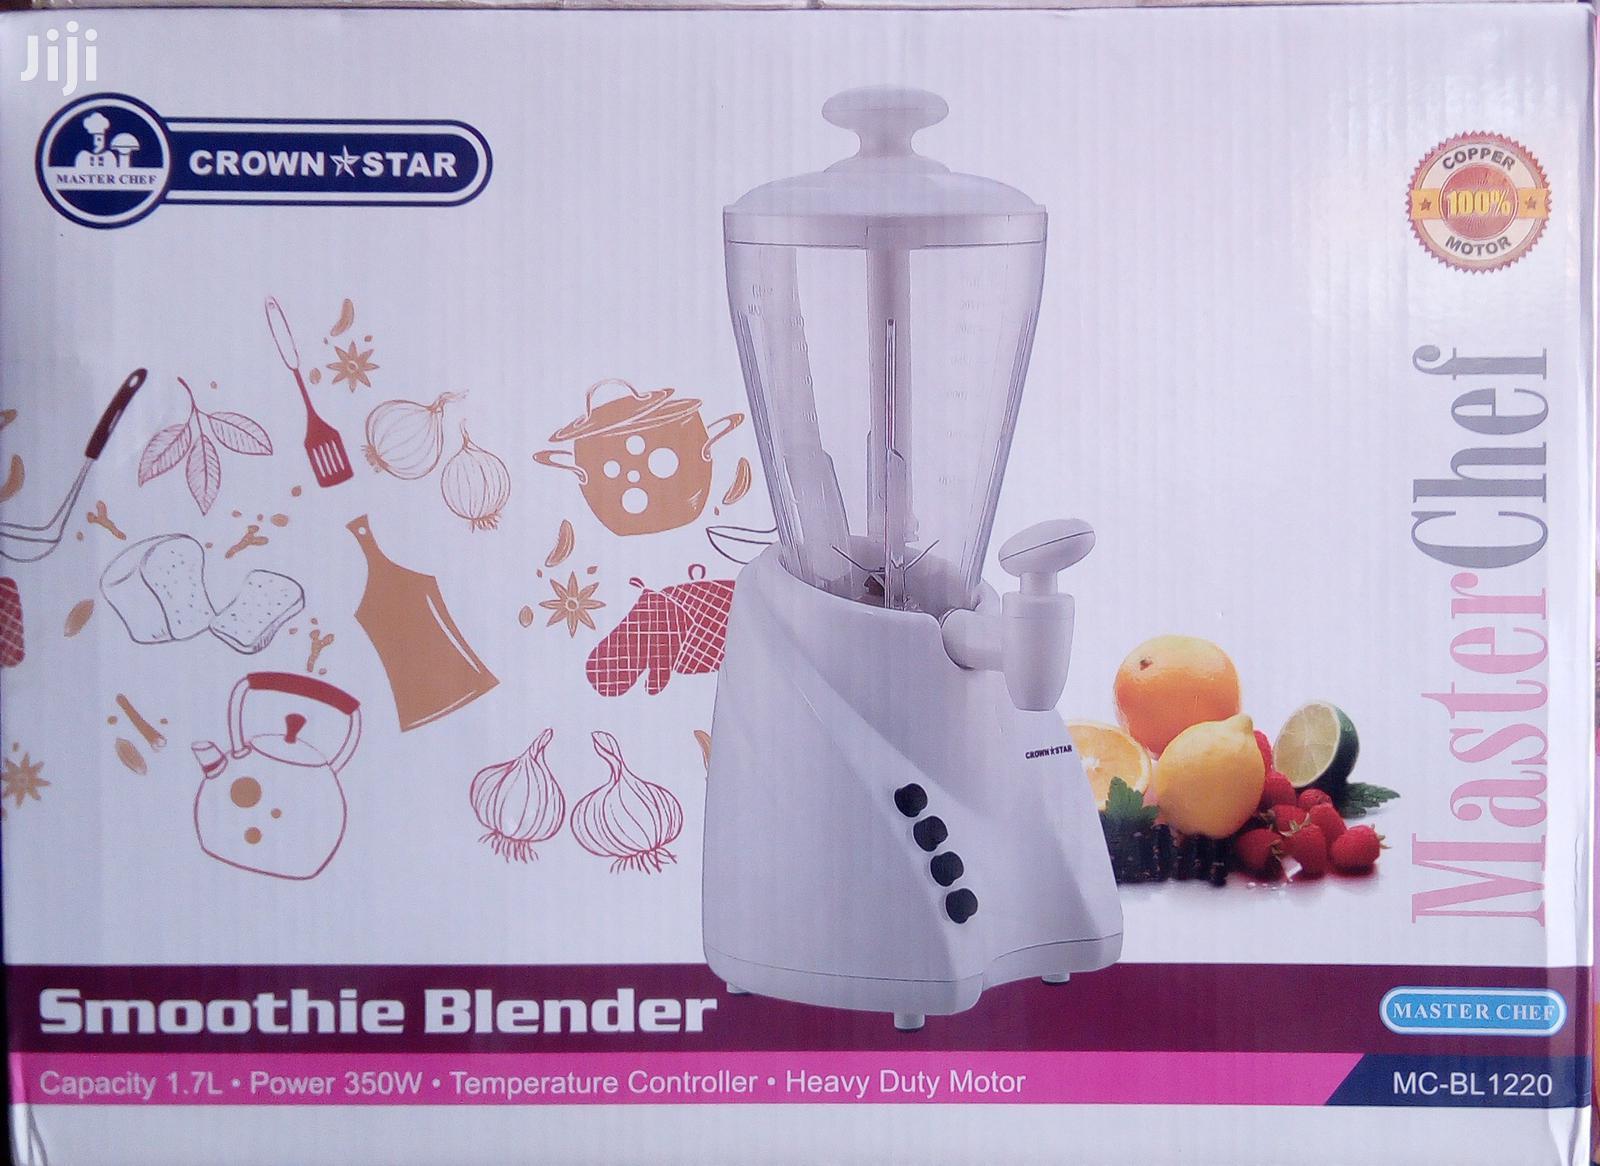 Master Chef Smoothie Blender